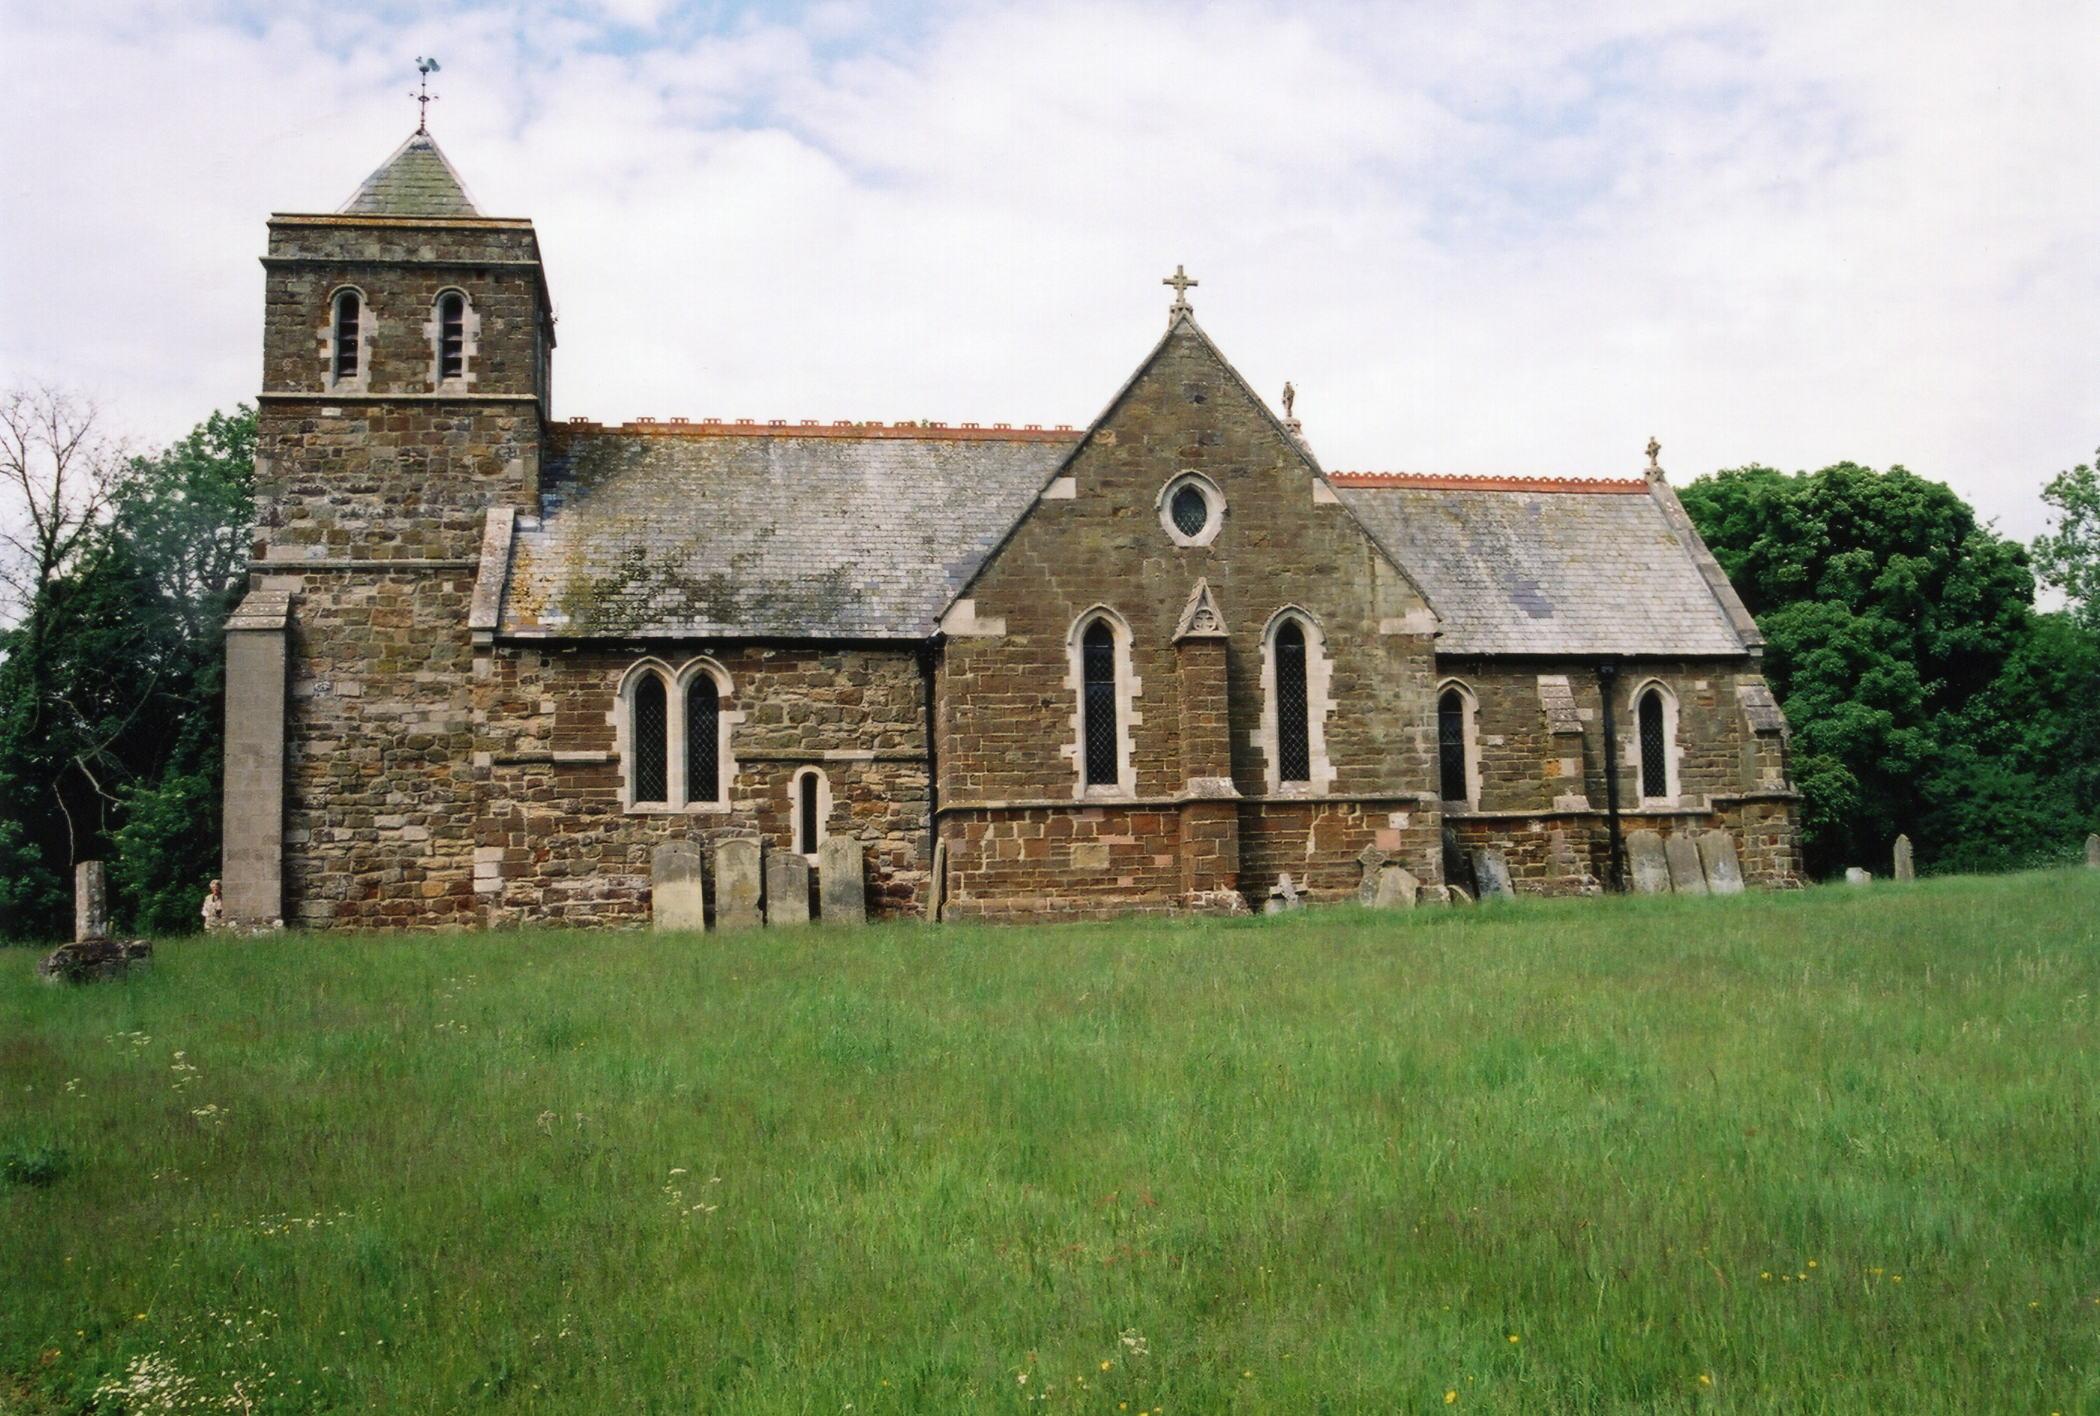 Benniworth St. Julian church